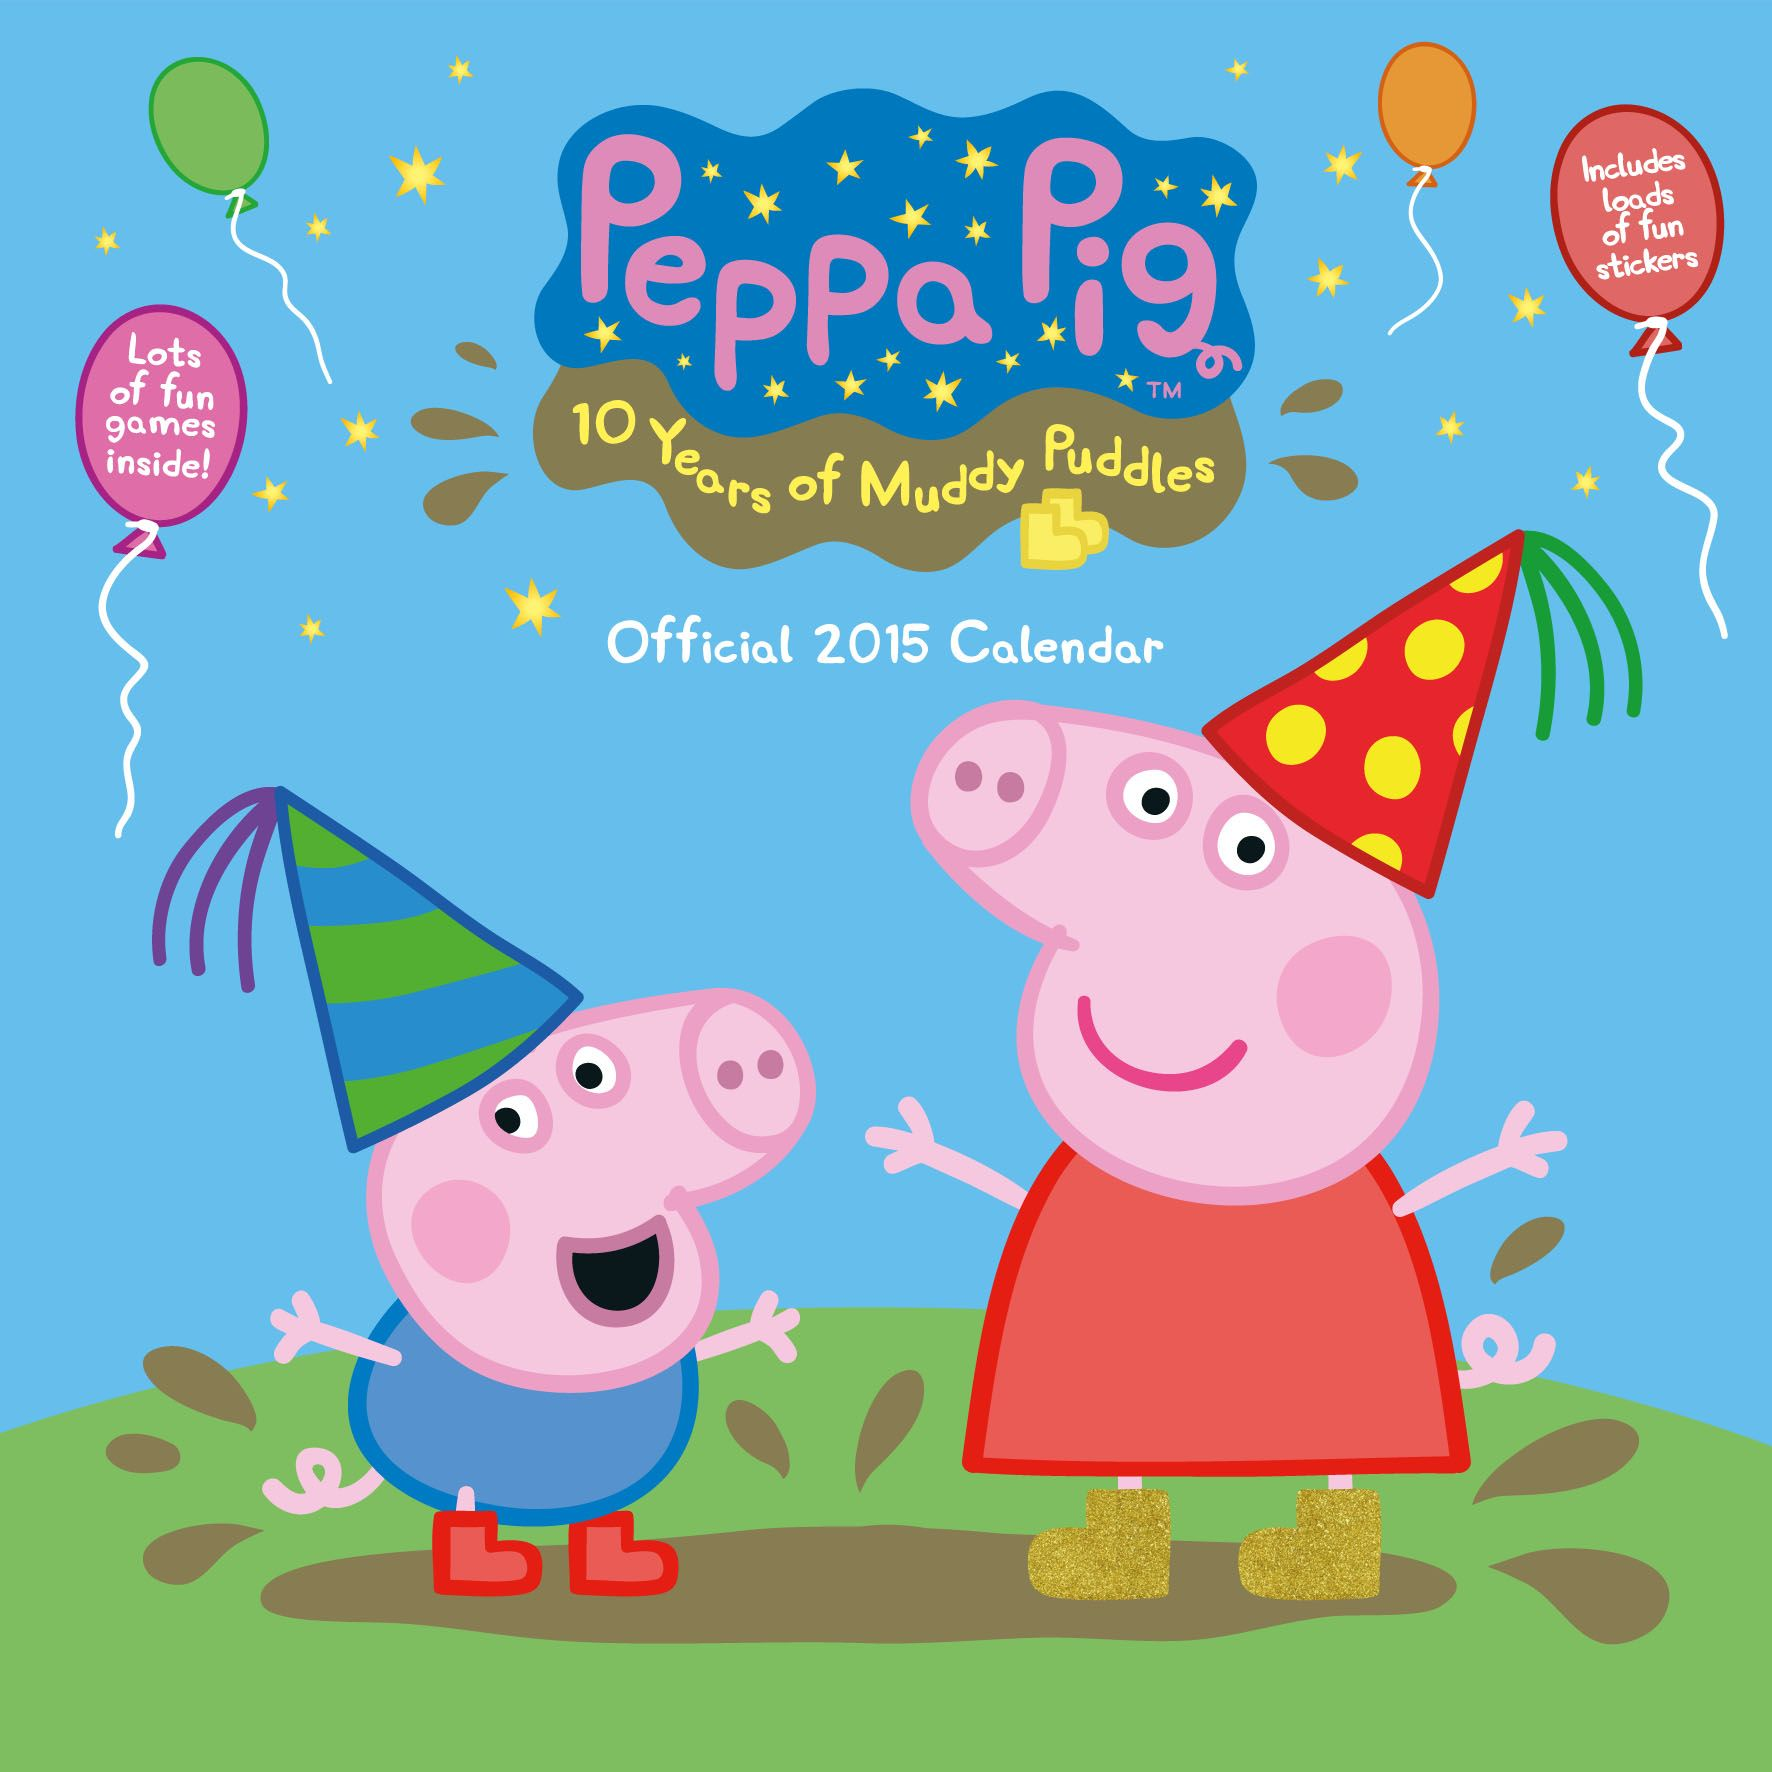 Peppa Pig Full HD Wallpaper Wallpaper | Fairy Tales / Cartoon ...